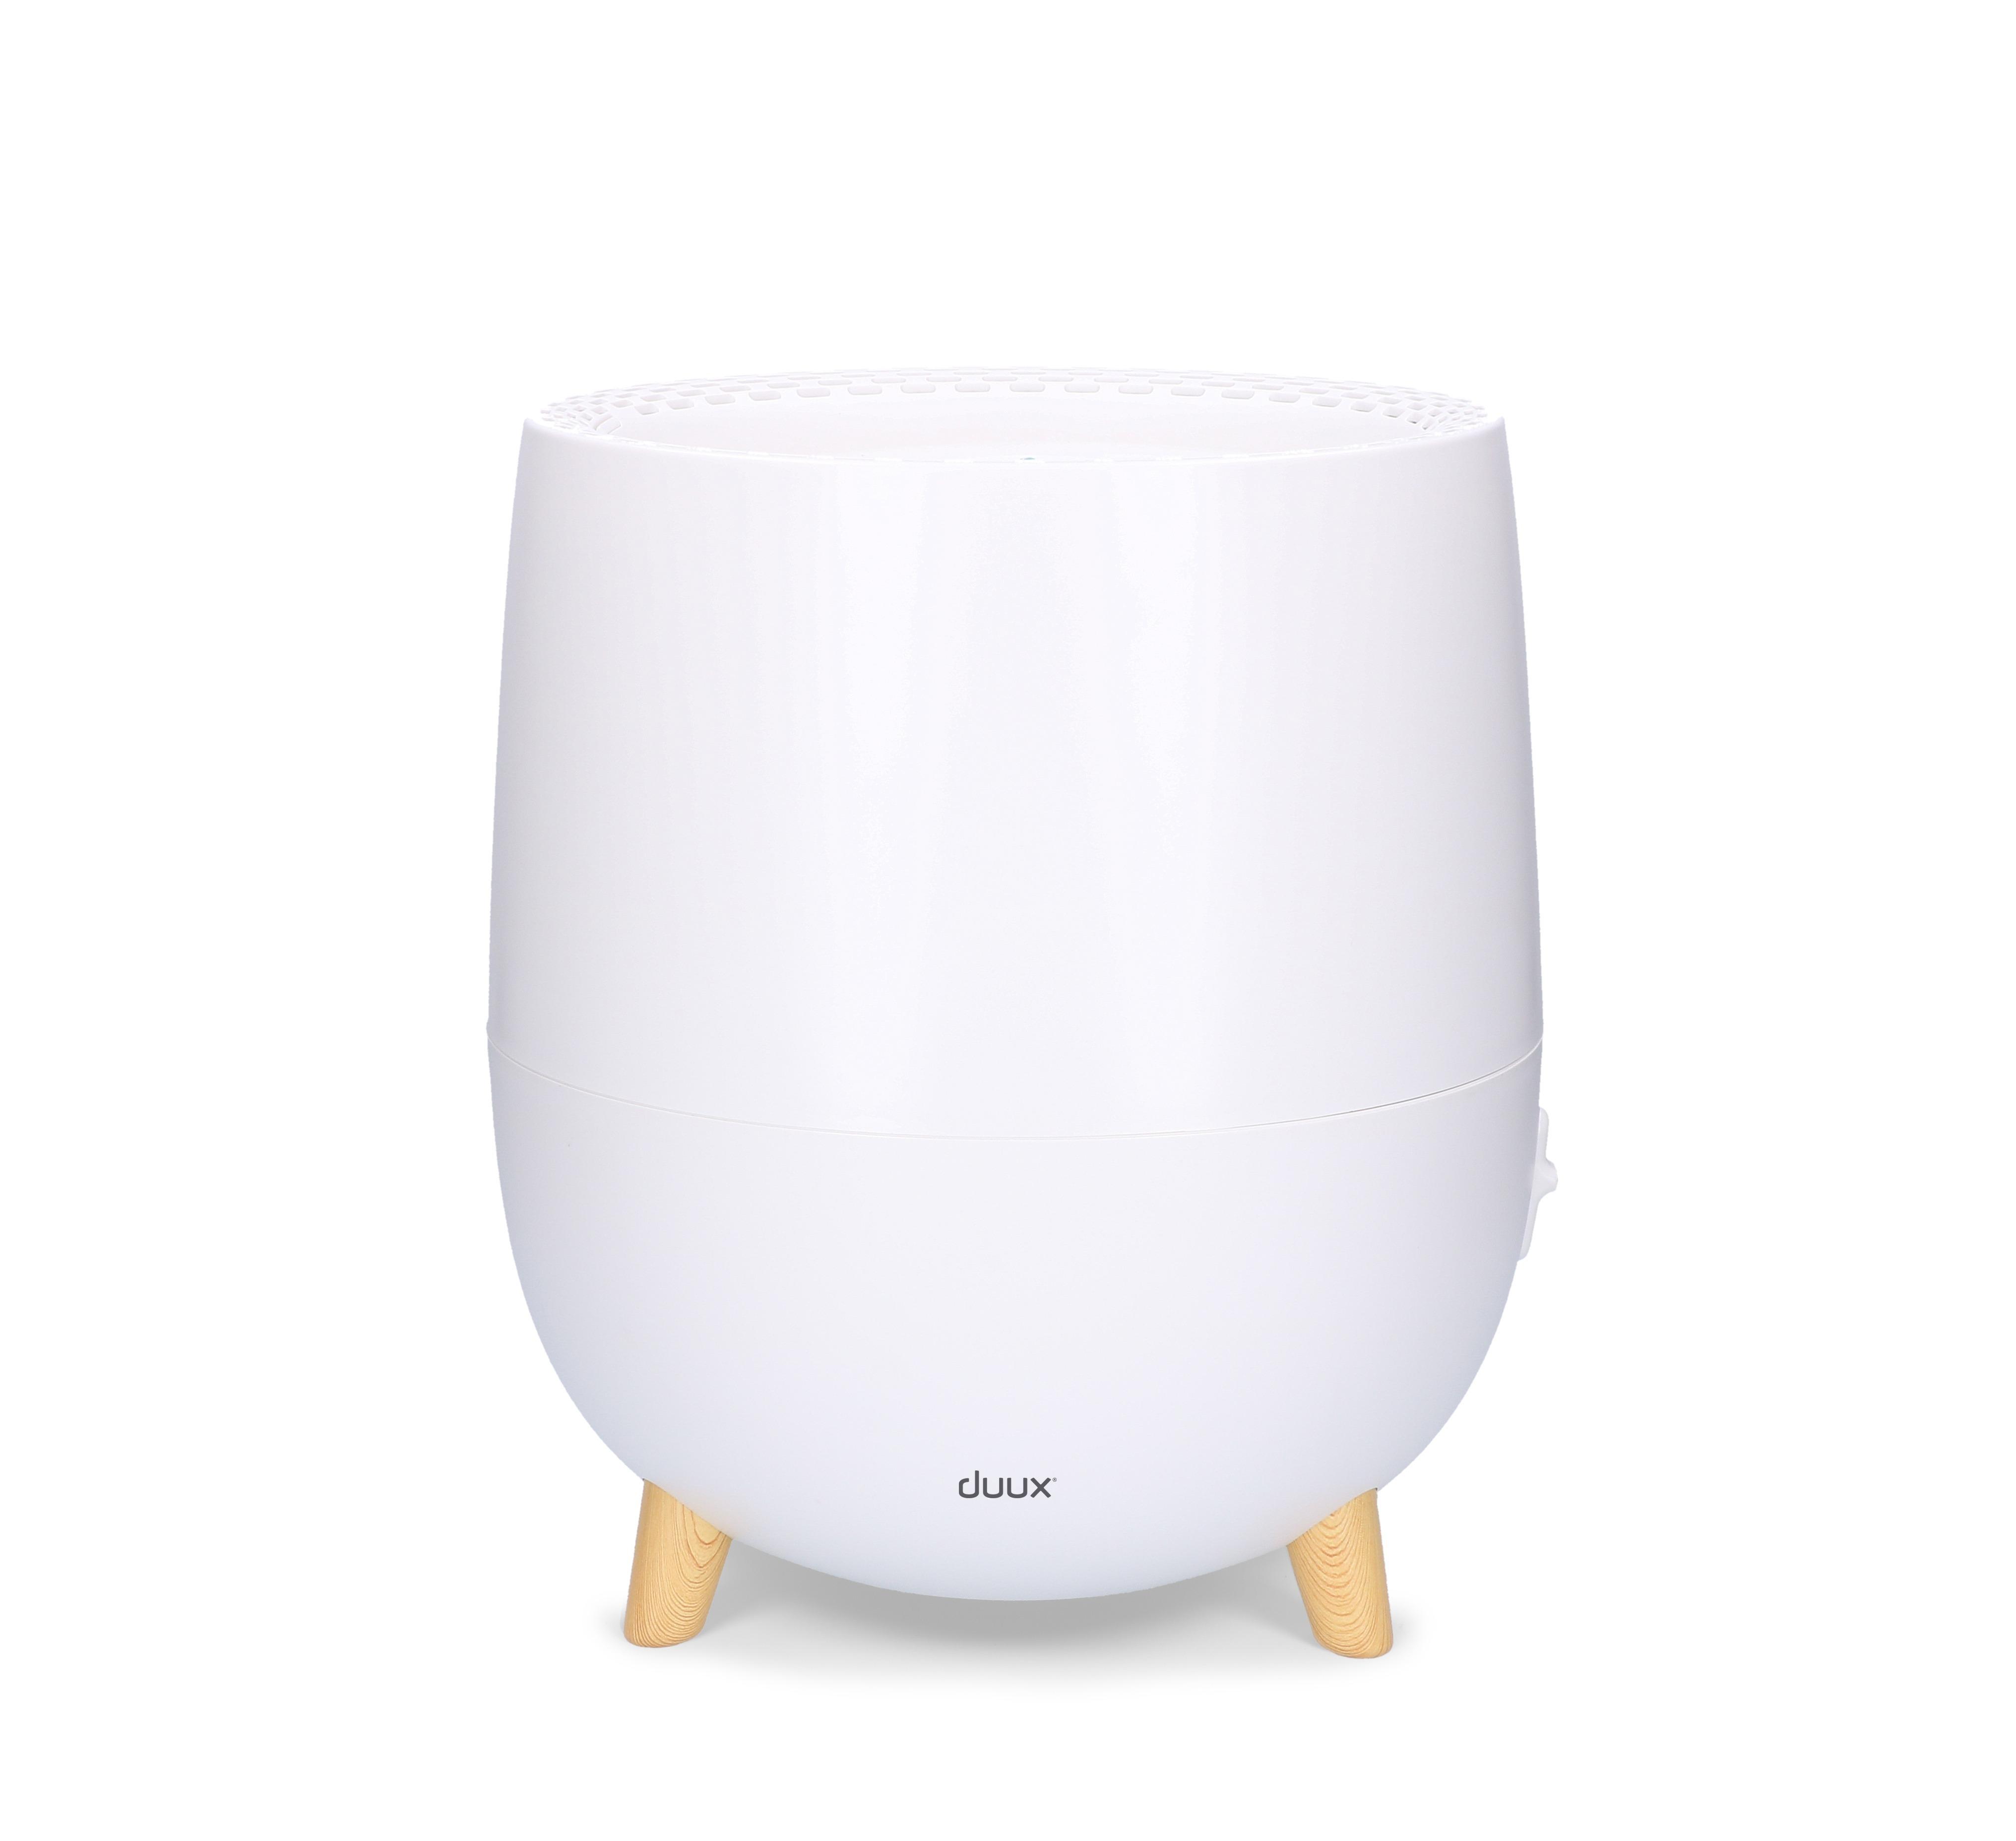 Duux luchtbevochtiger Ovi Evaporative Humidifier wit